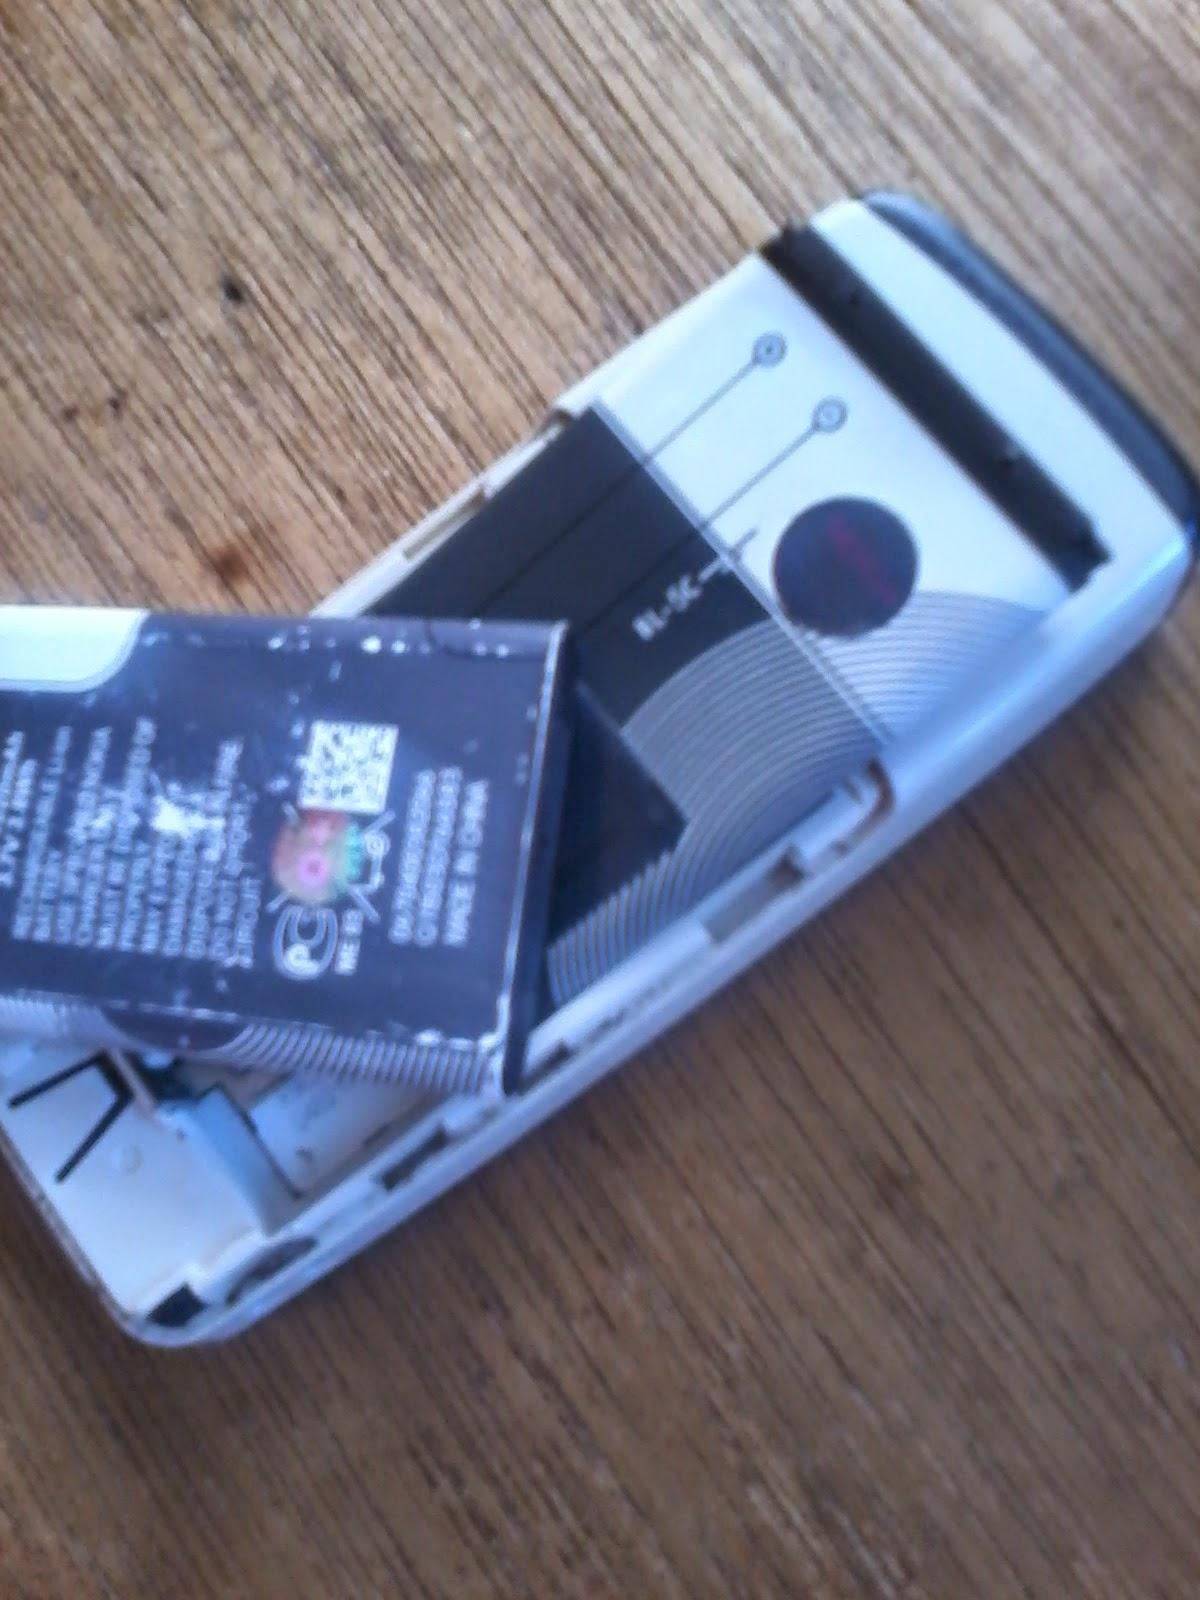 cara membuat batere handphone awet